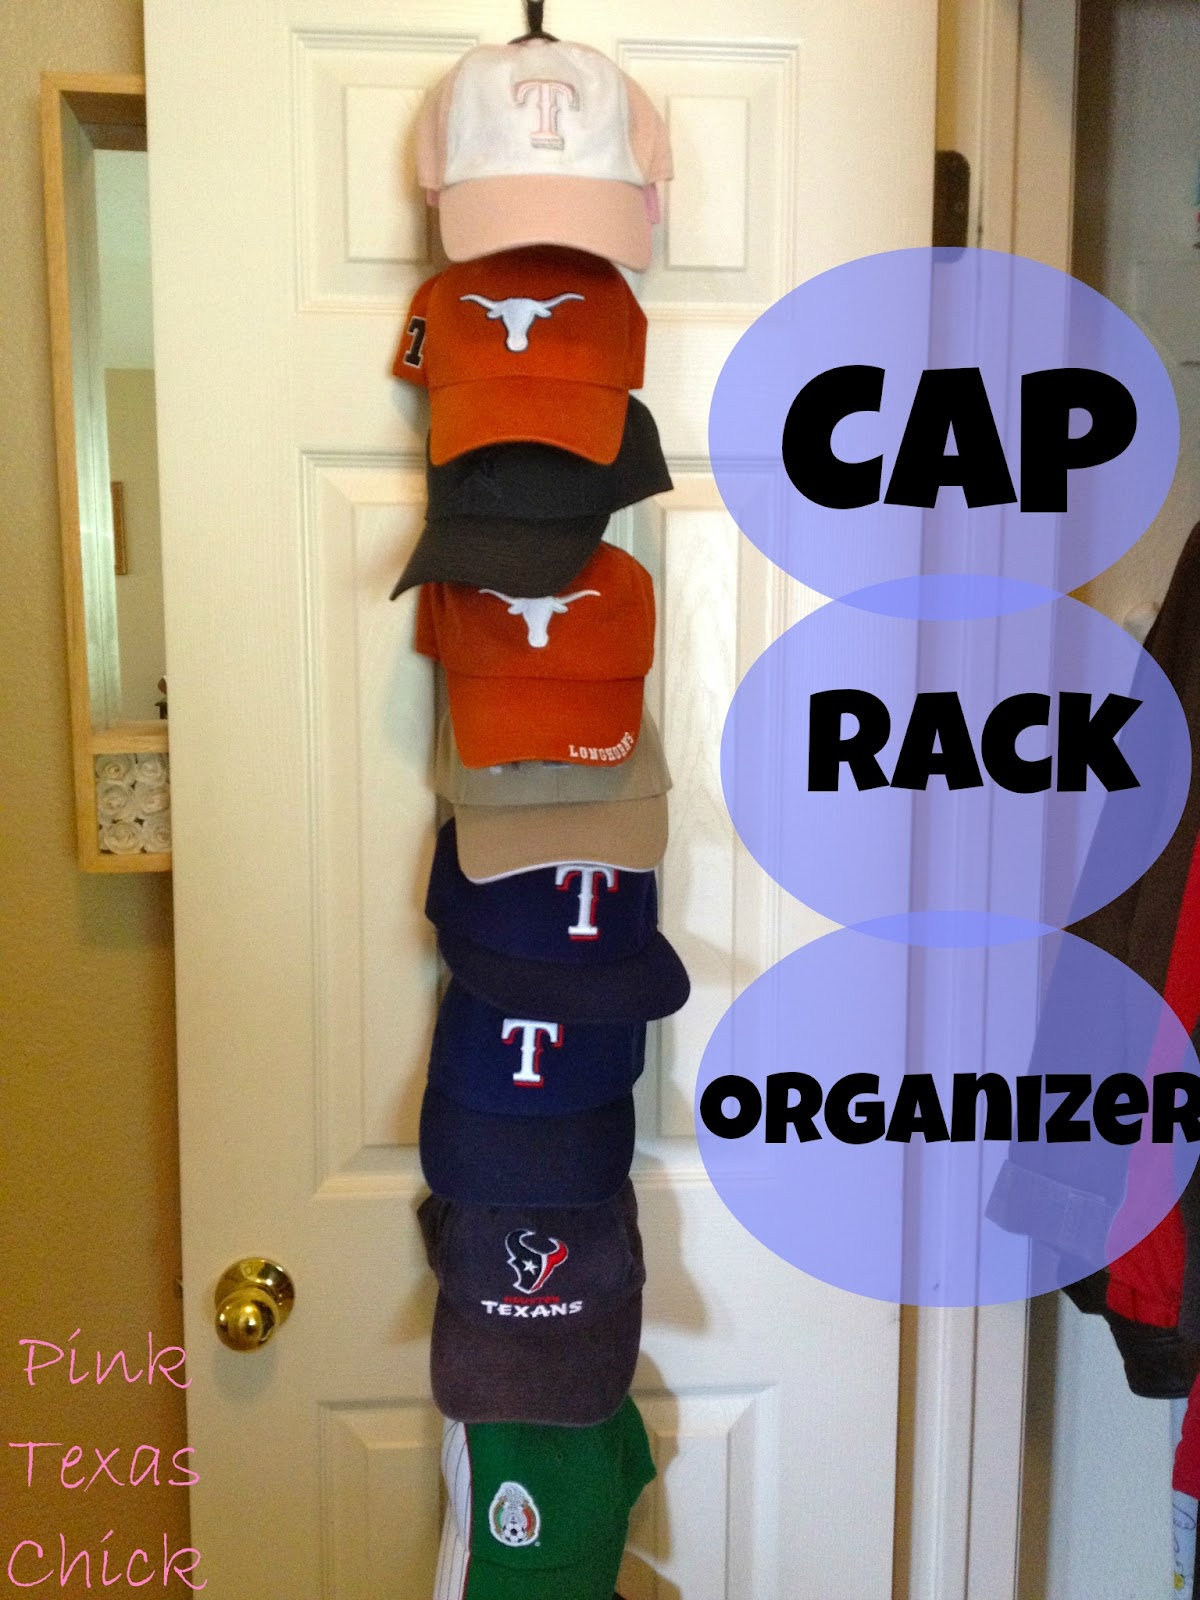 Pink Texas Chick Baseball Cap Rack Organizer